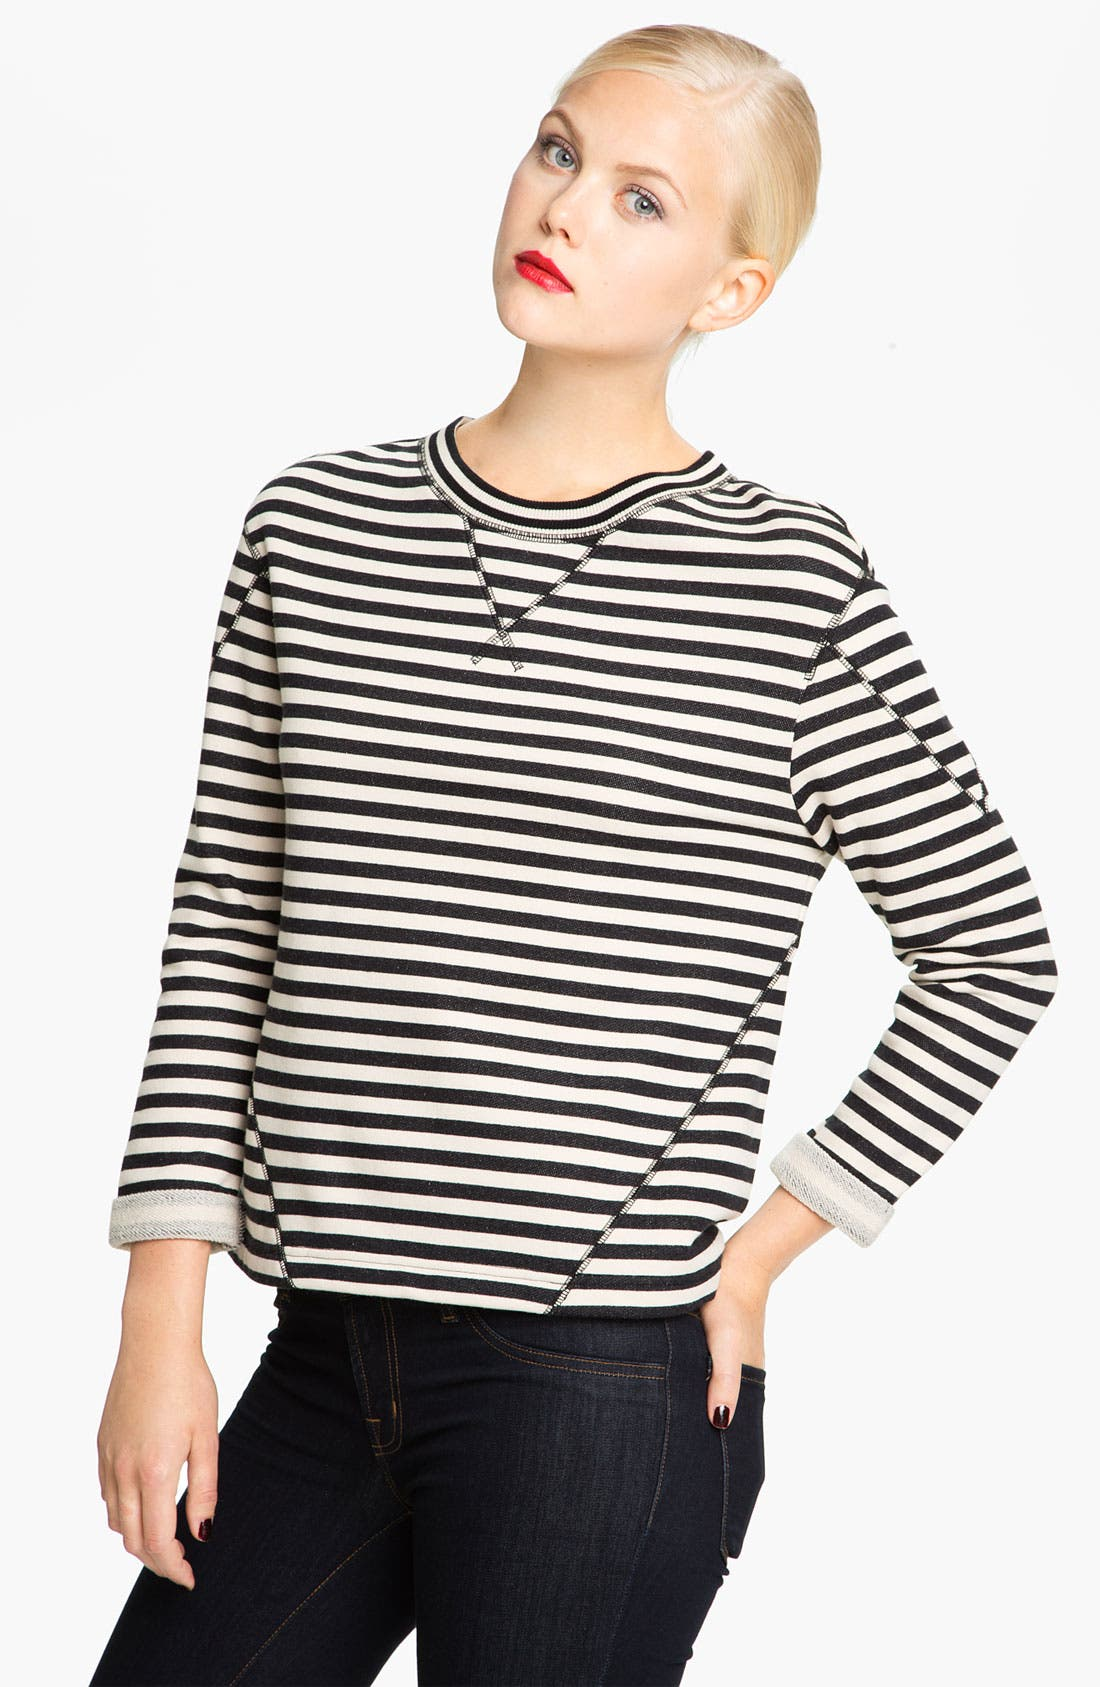 Alternate Image 1 Selected - MARC BY MARC JACOBS 'Ben' Stripe Sweatshirt